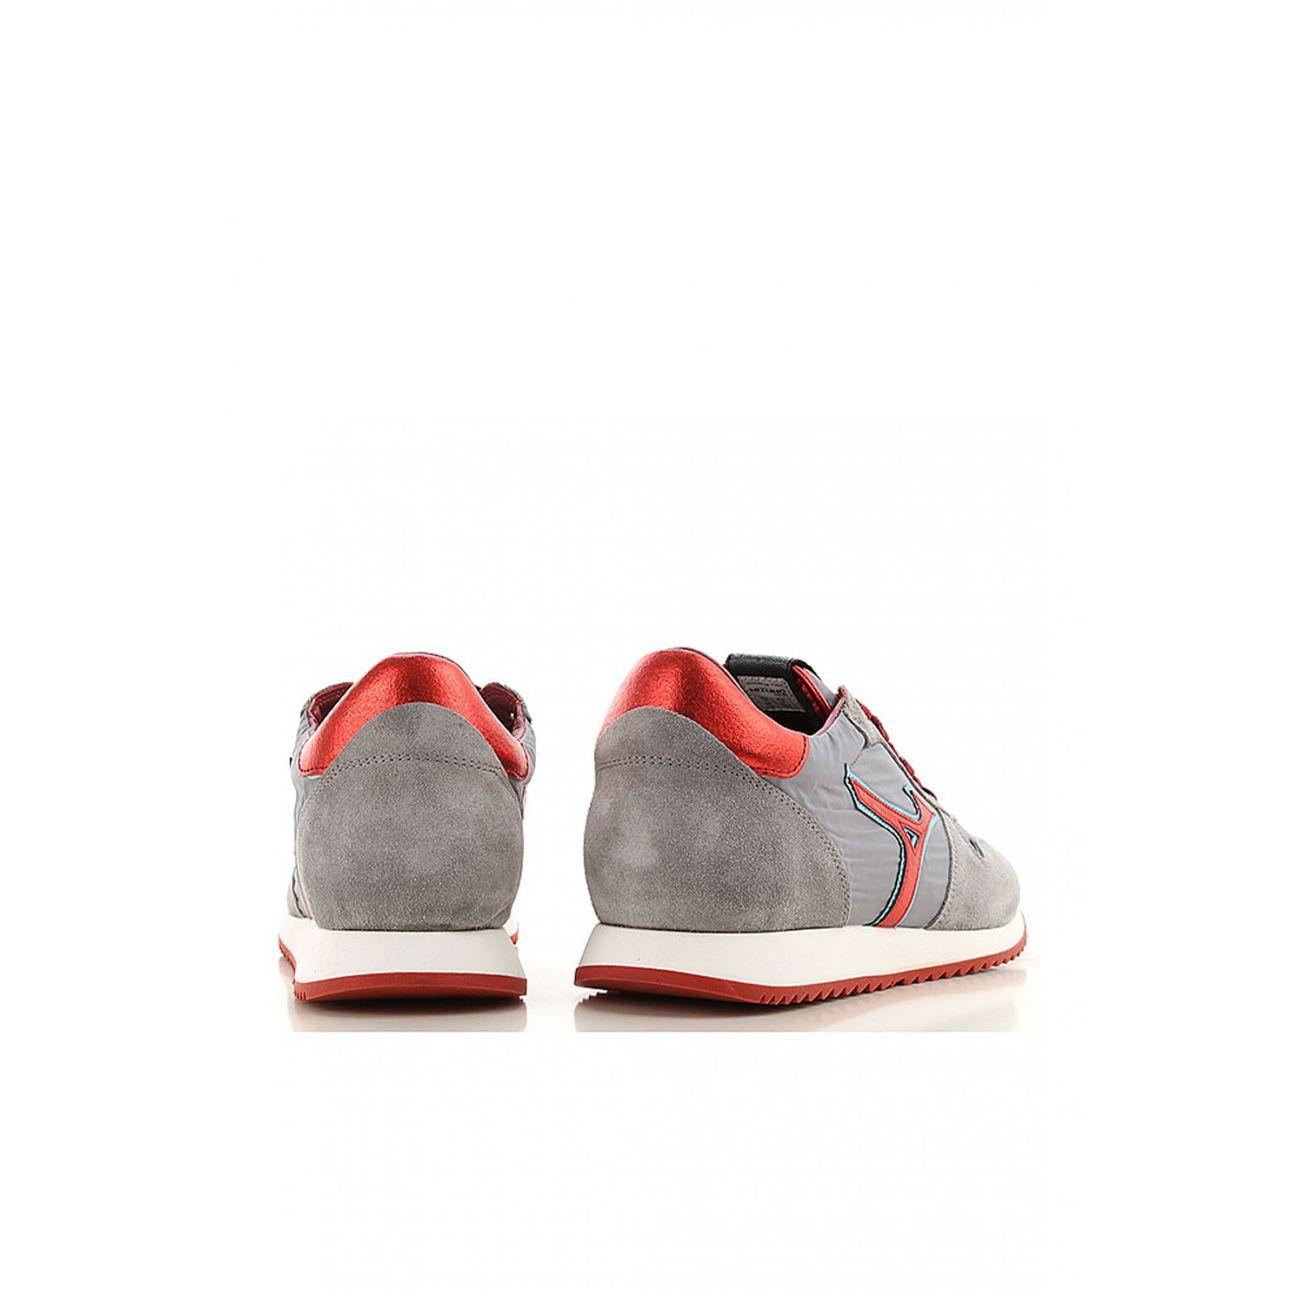 homme MIZUNO Sneakers Lifestyle cuir ETAMIN 2  -  Mizuno - Homme